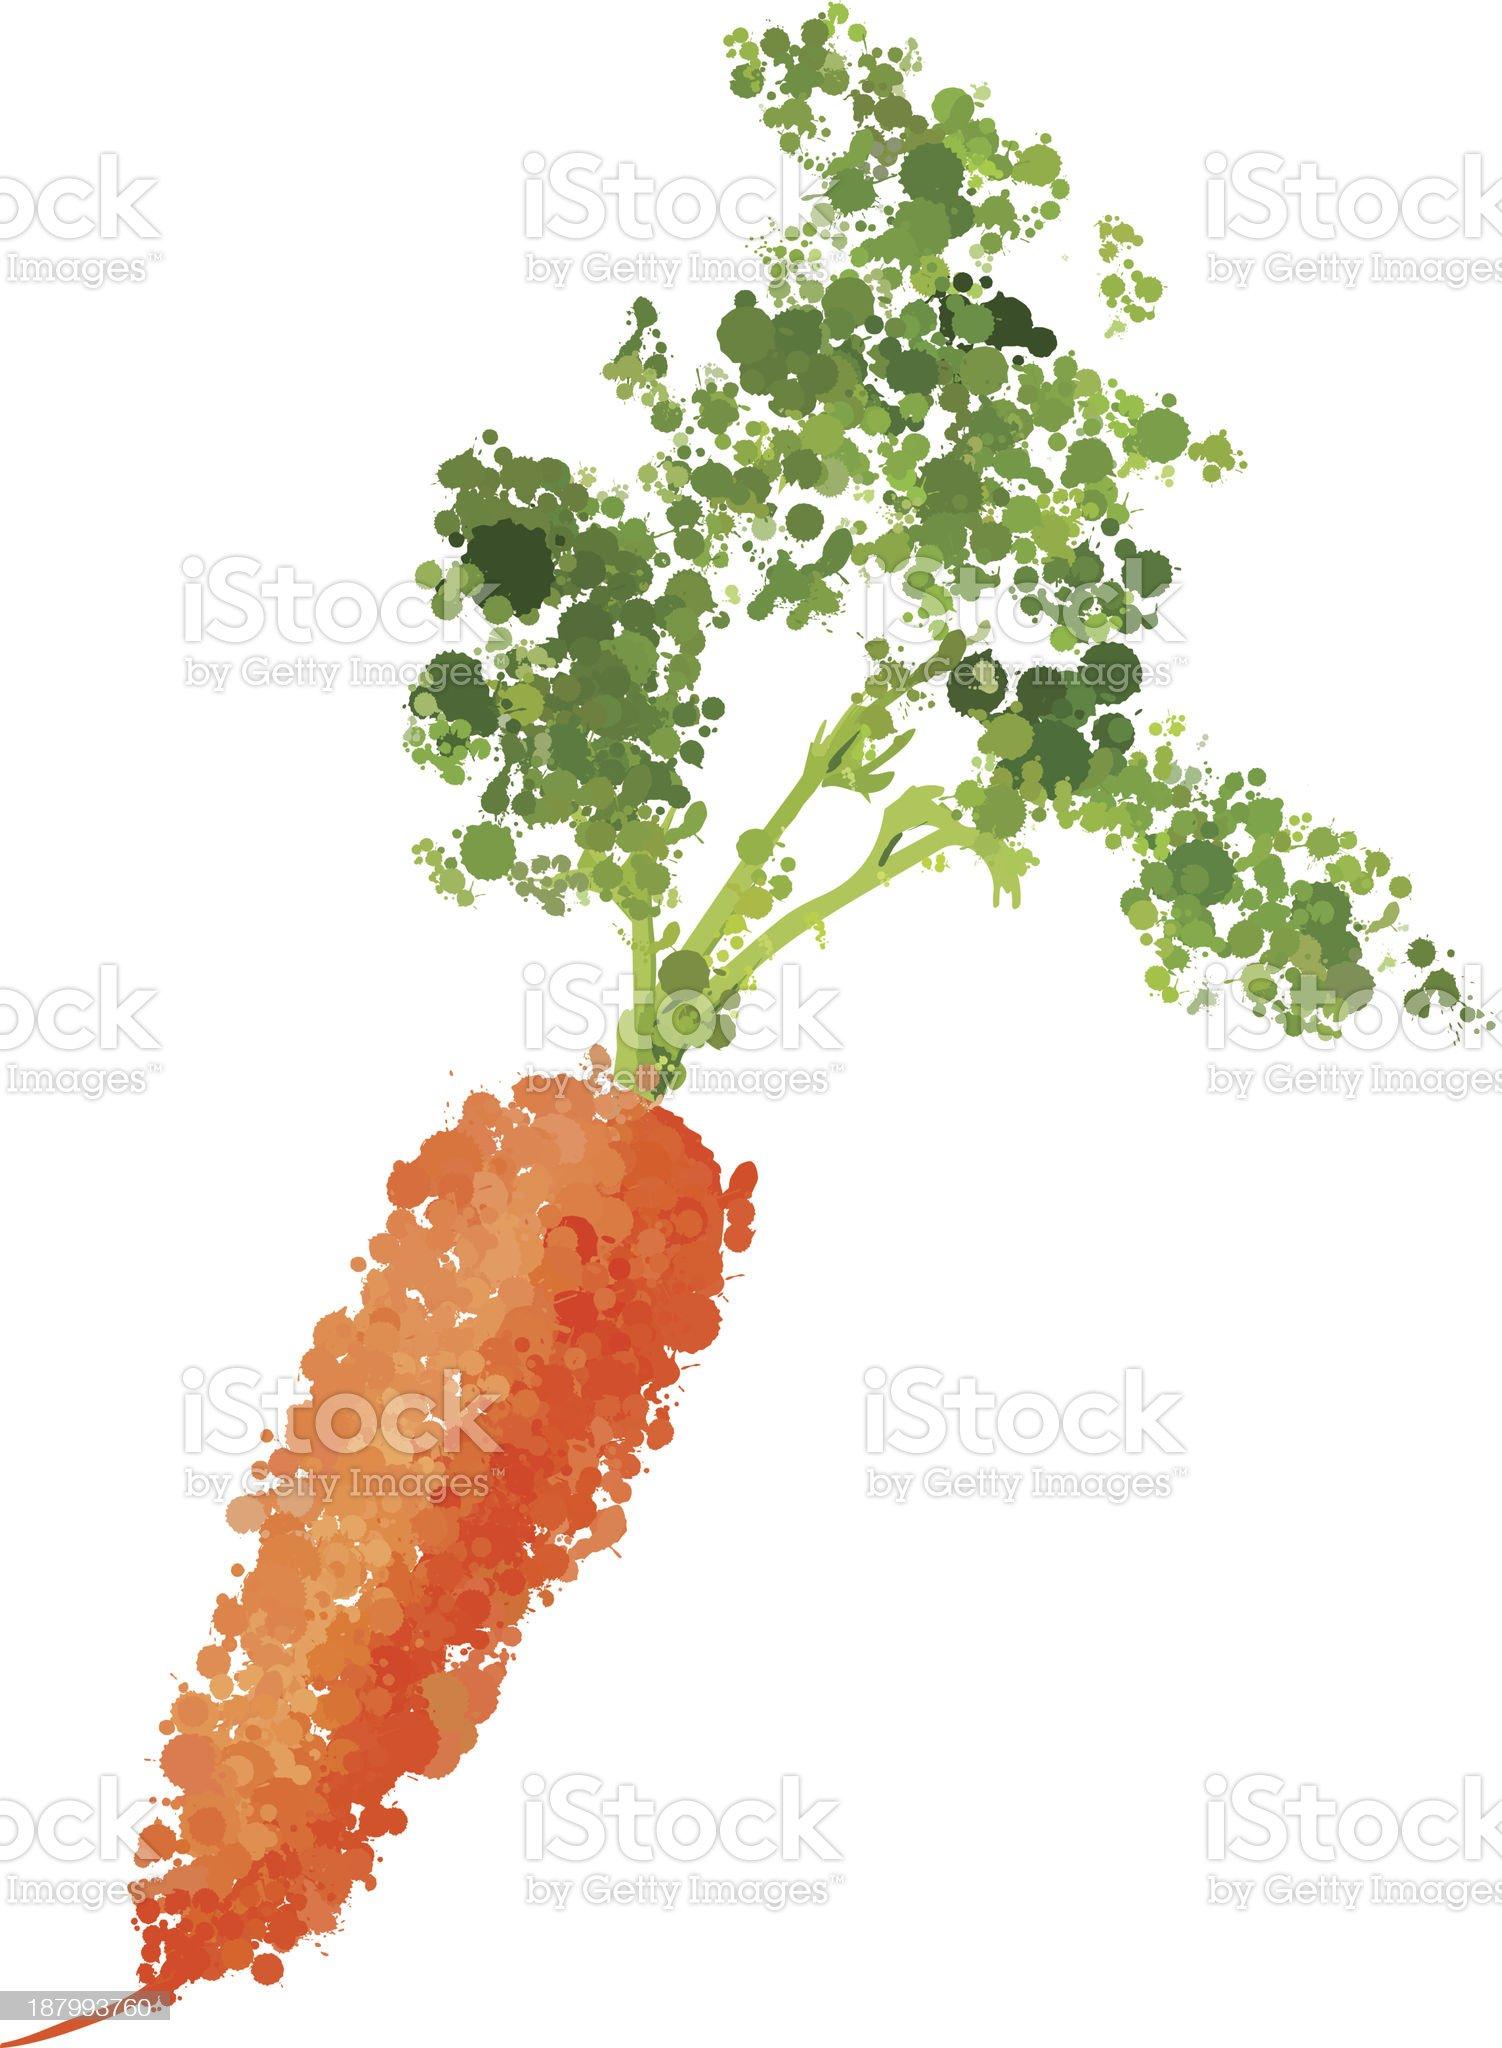 Ripe fresh carrots vector illustration of blots royalty-free stock vector art